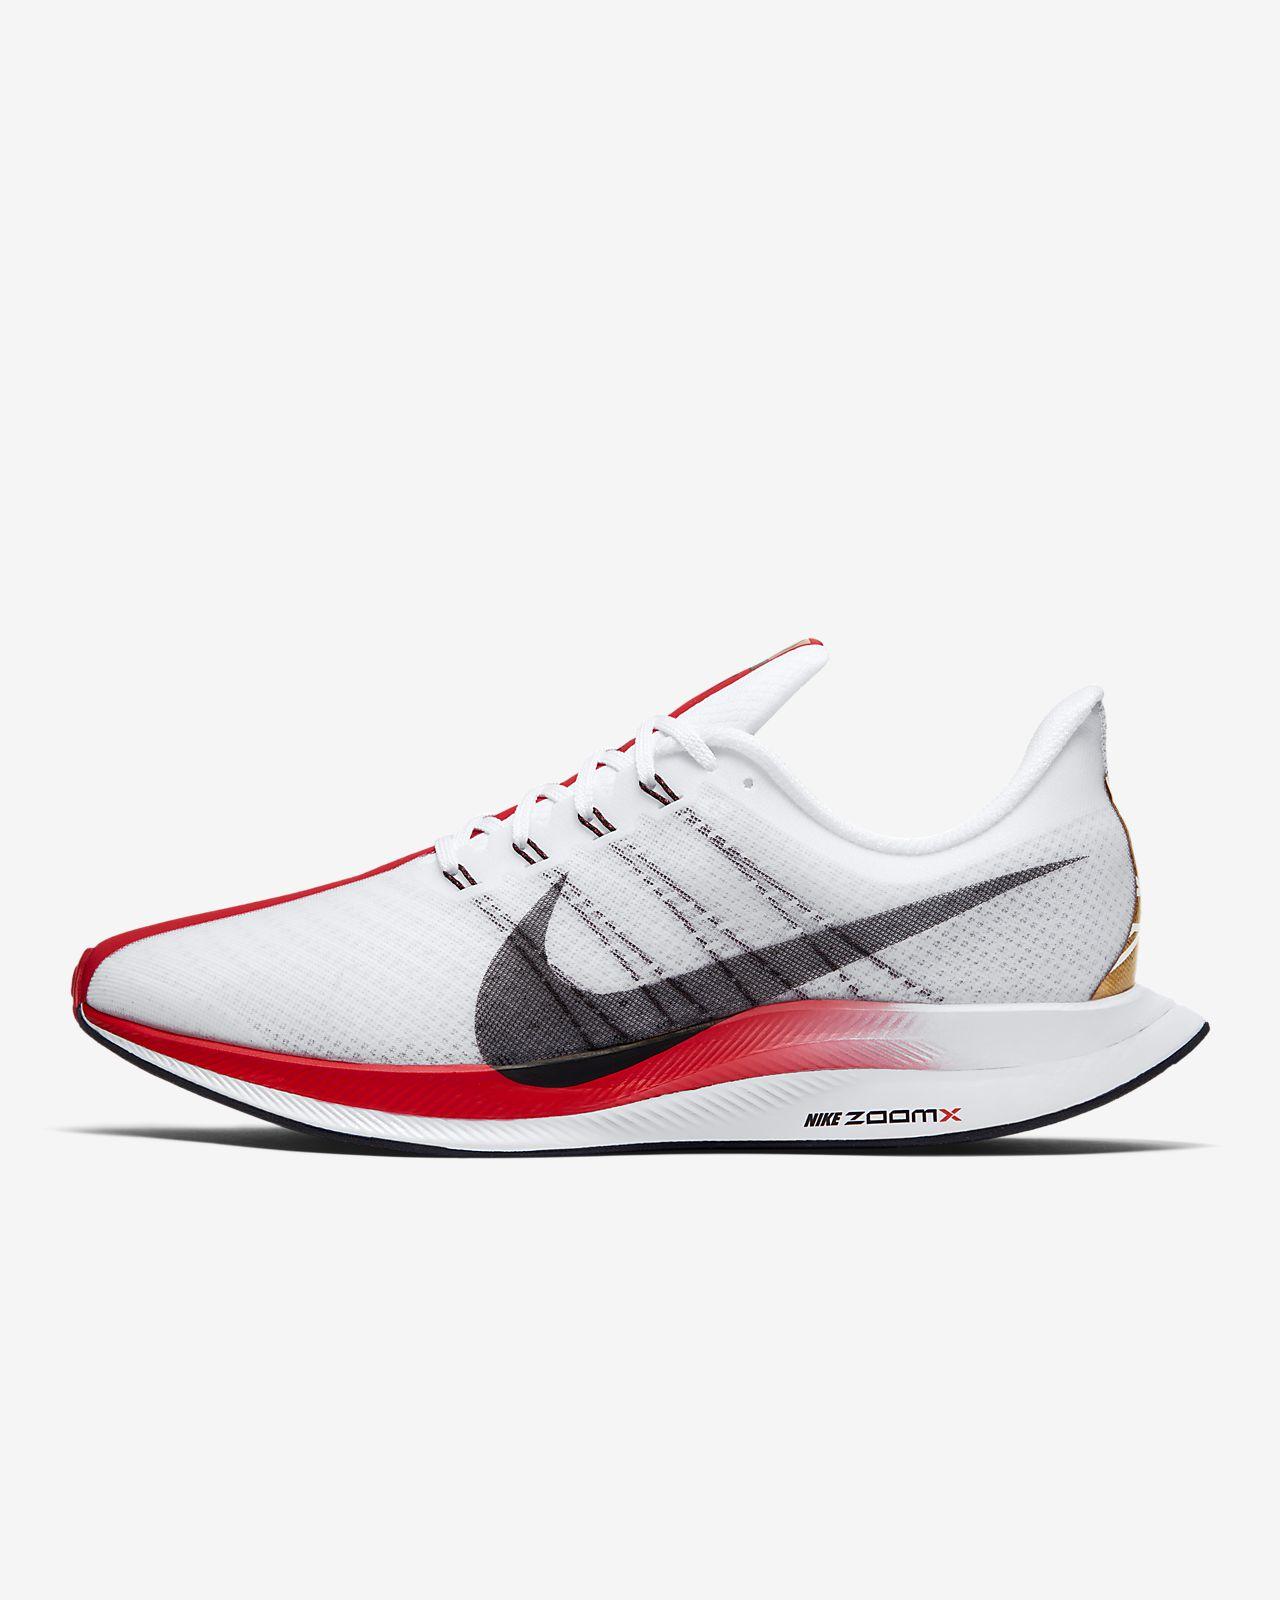 d28d2b54 Беговые кроссовки Nike Zoom Pegasus 35 Turbo Mo Farah. Nike.com RU